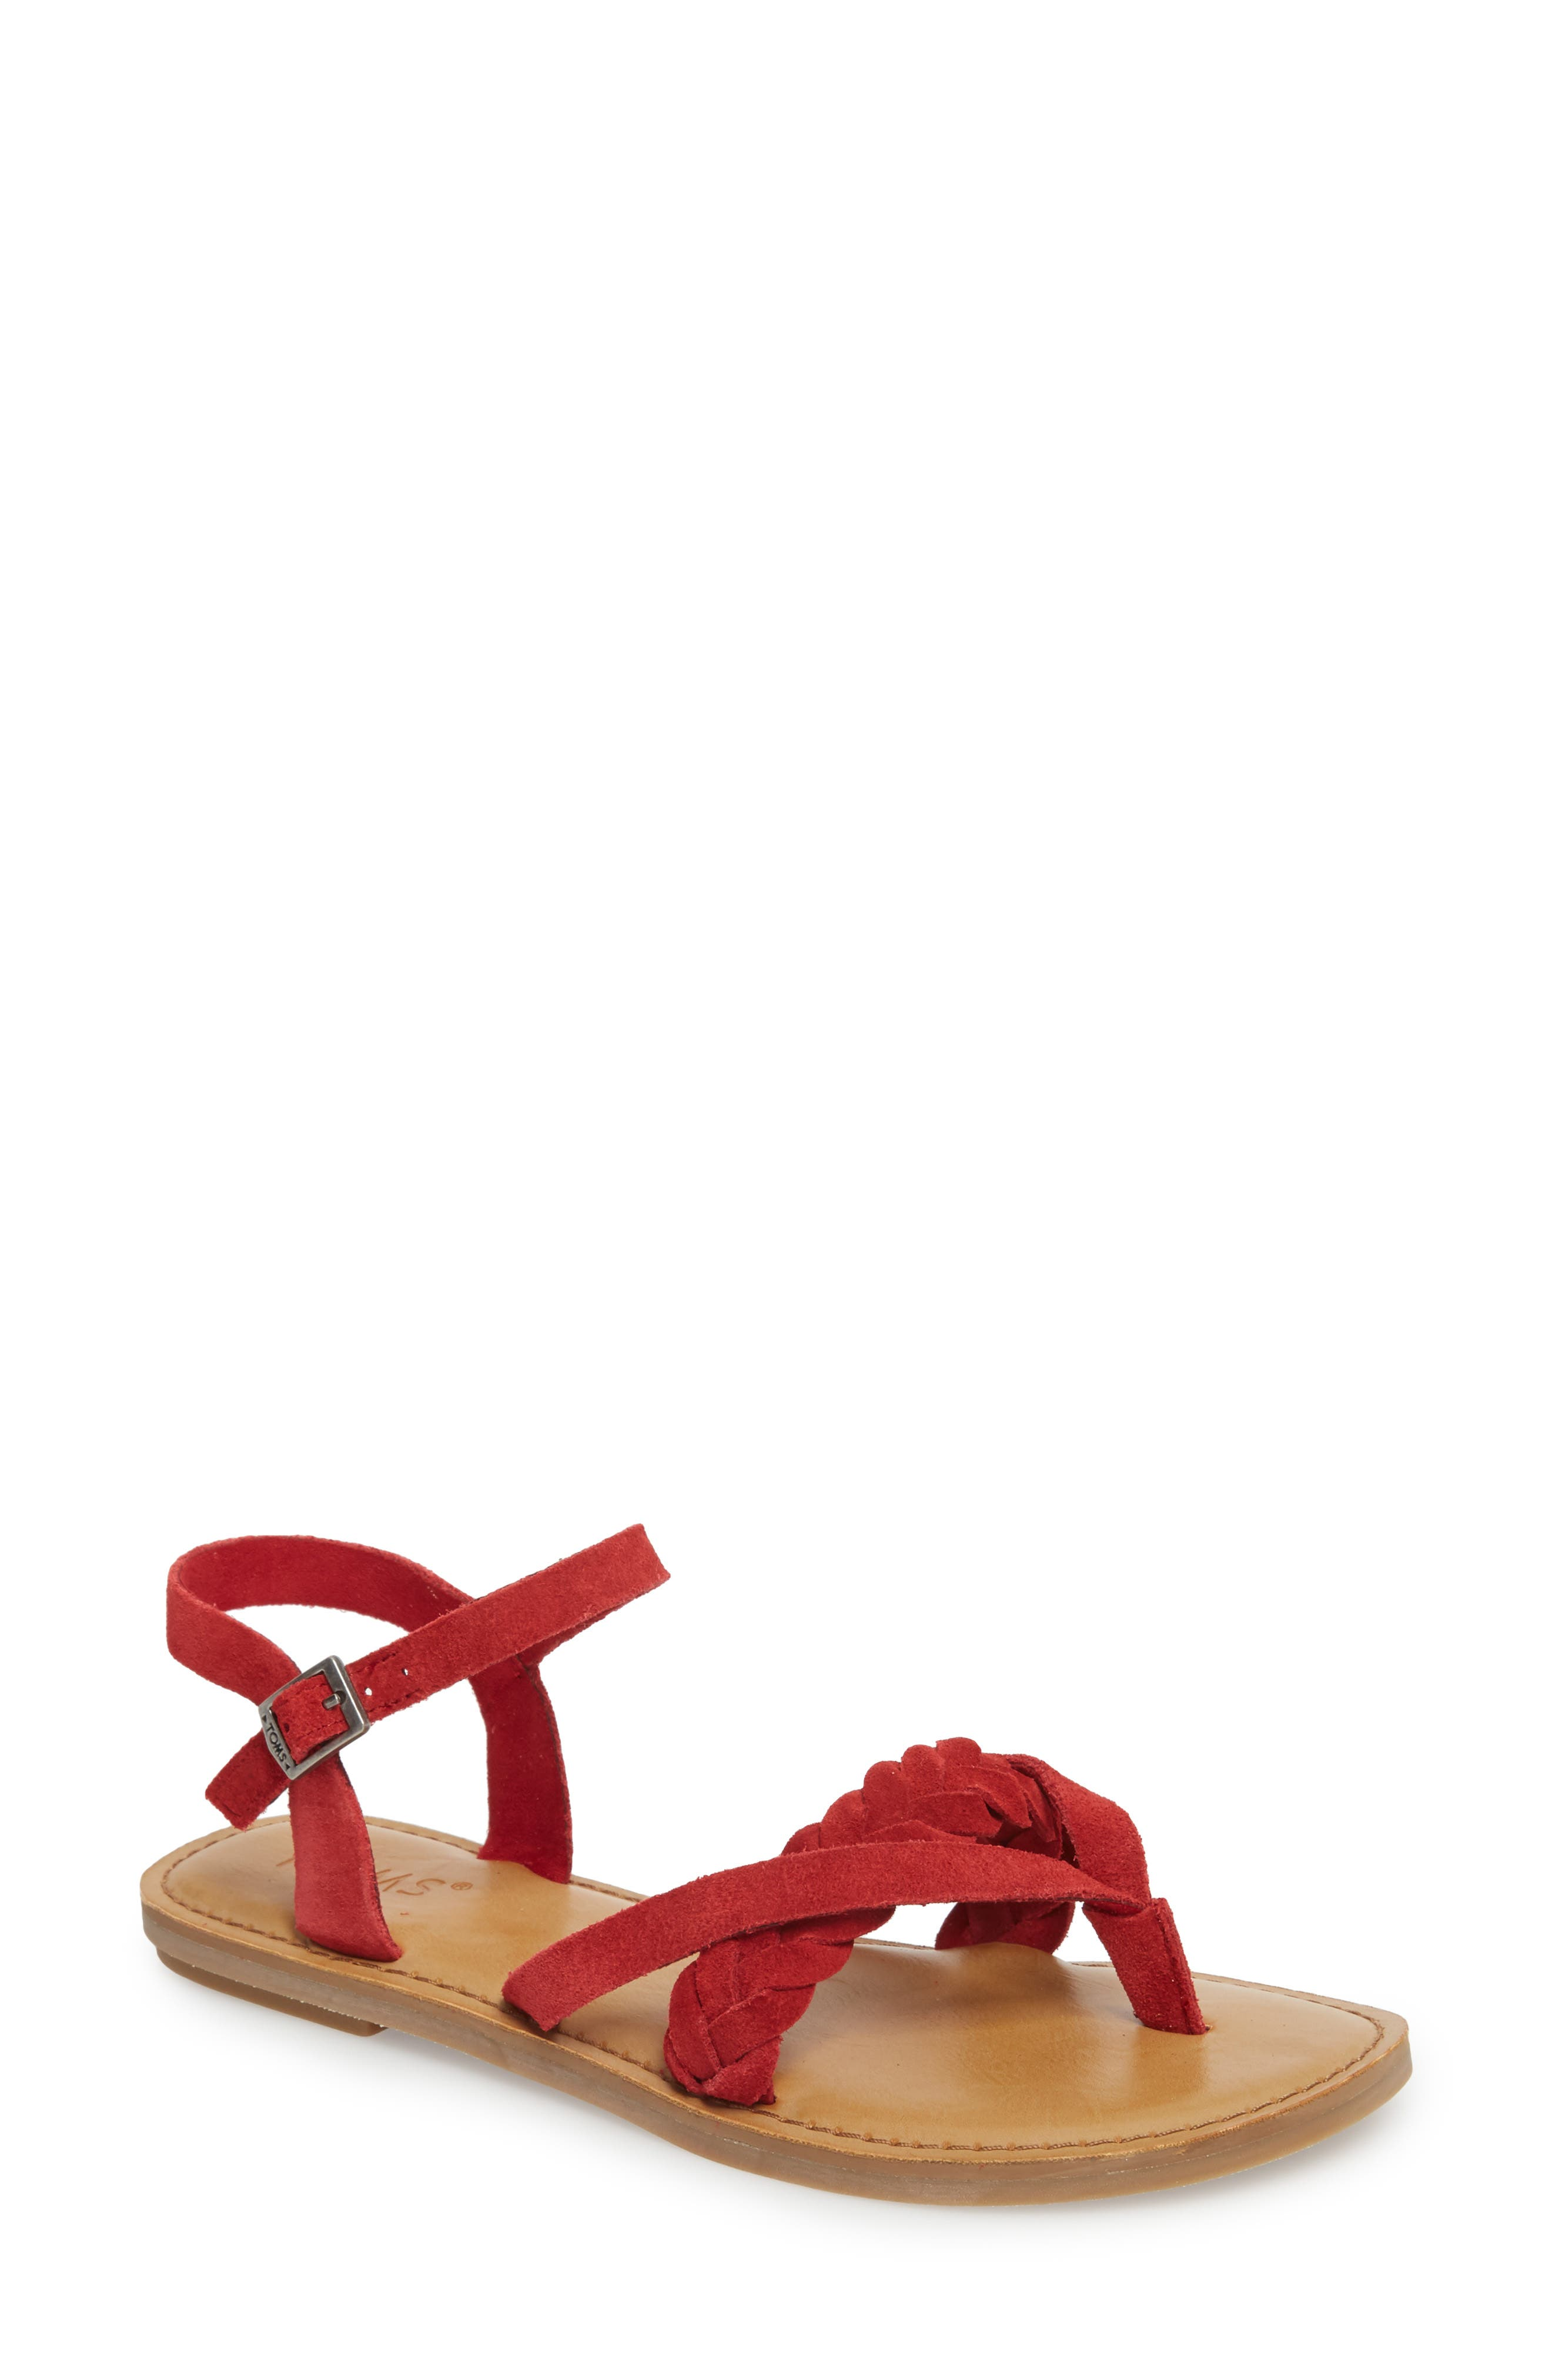 'Lexie' Sandal,                             Main thumbnail 1, color,